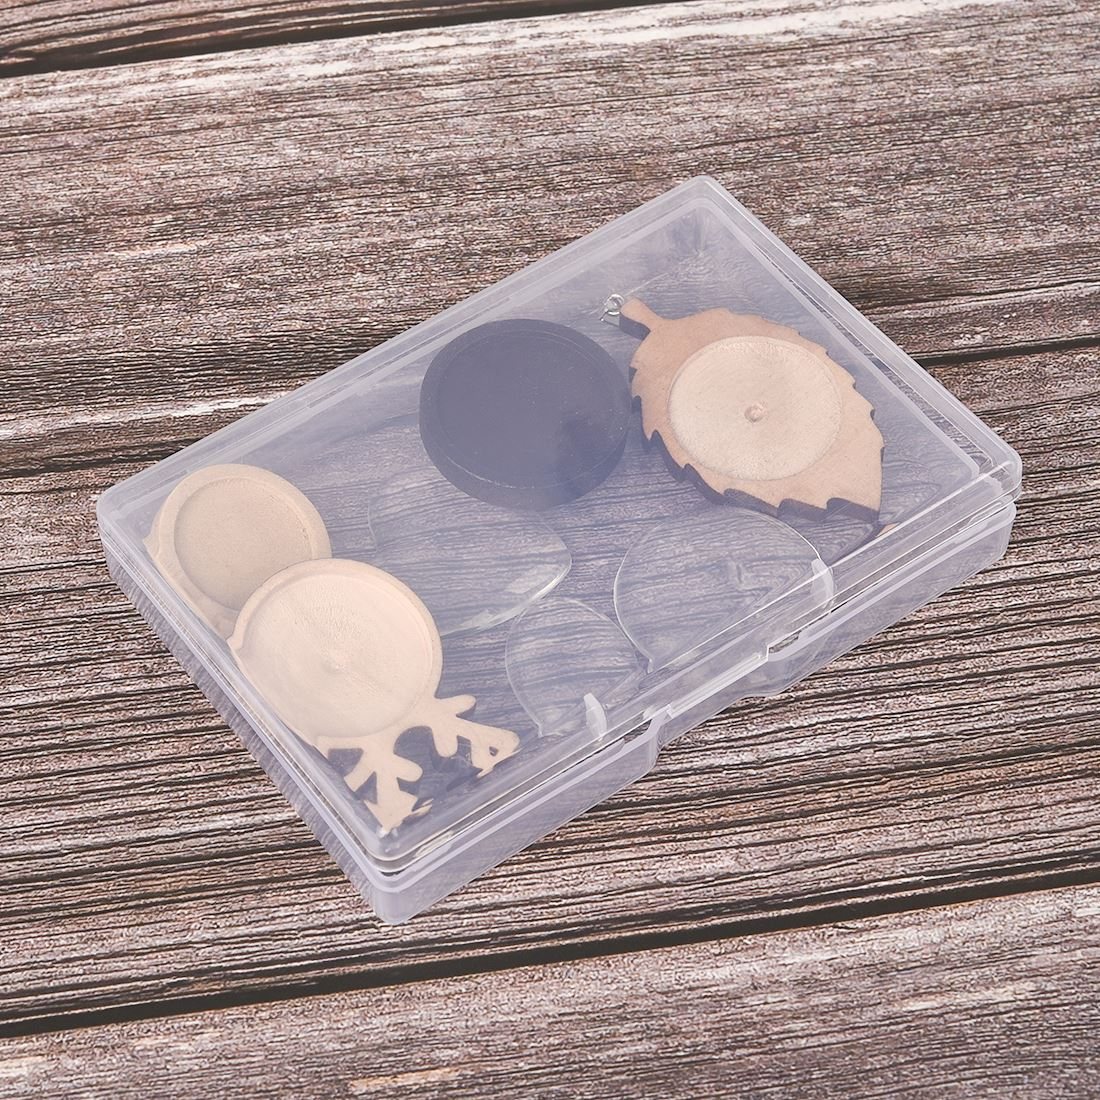 5pcs Jewelry Storage Square Plastic Box Transparent Clear Multipurpose Display Tool Case Craft Jewelry Organizer Boxes